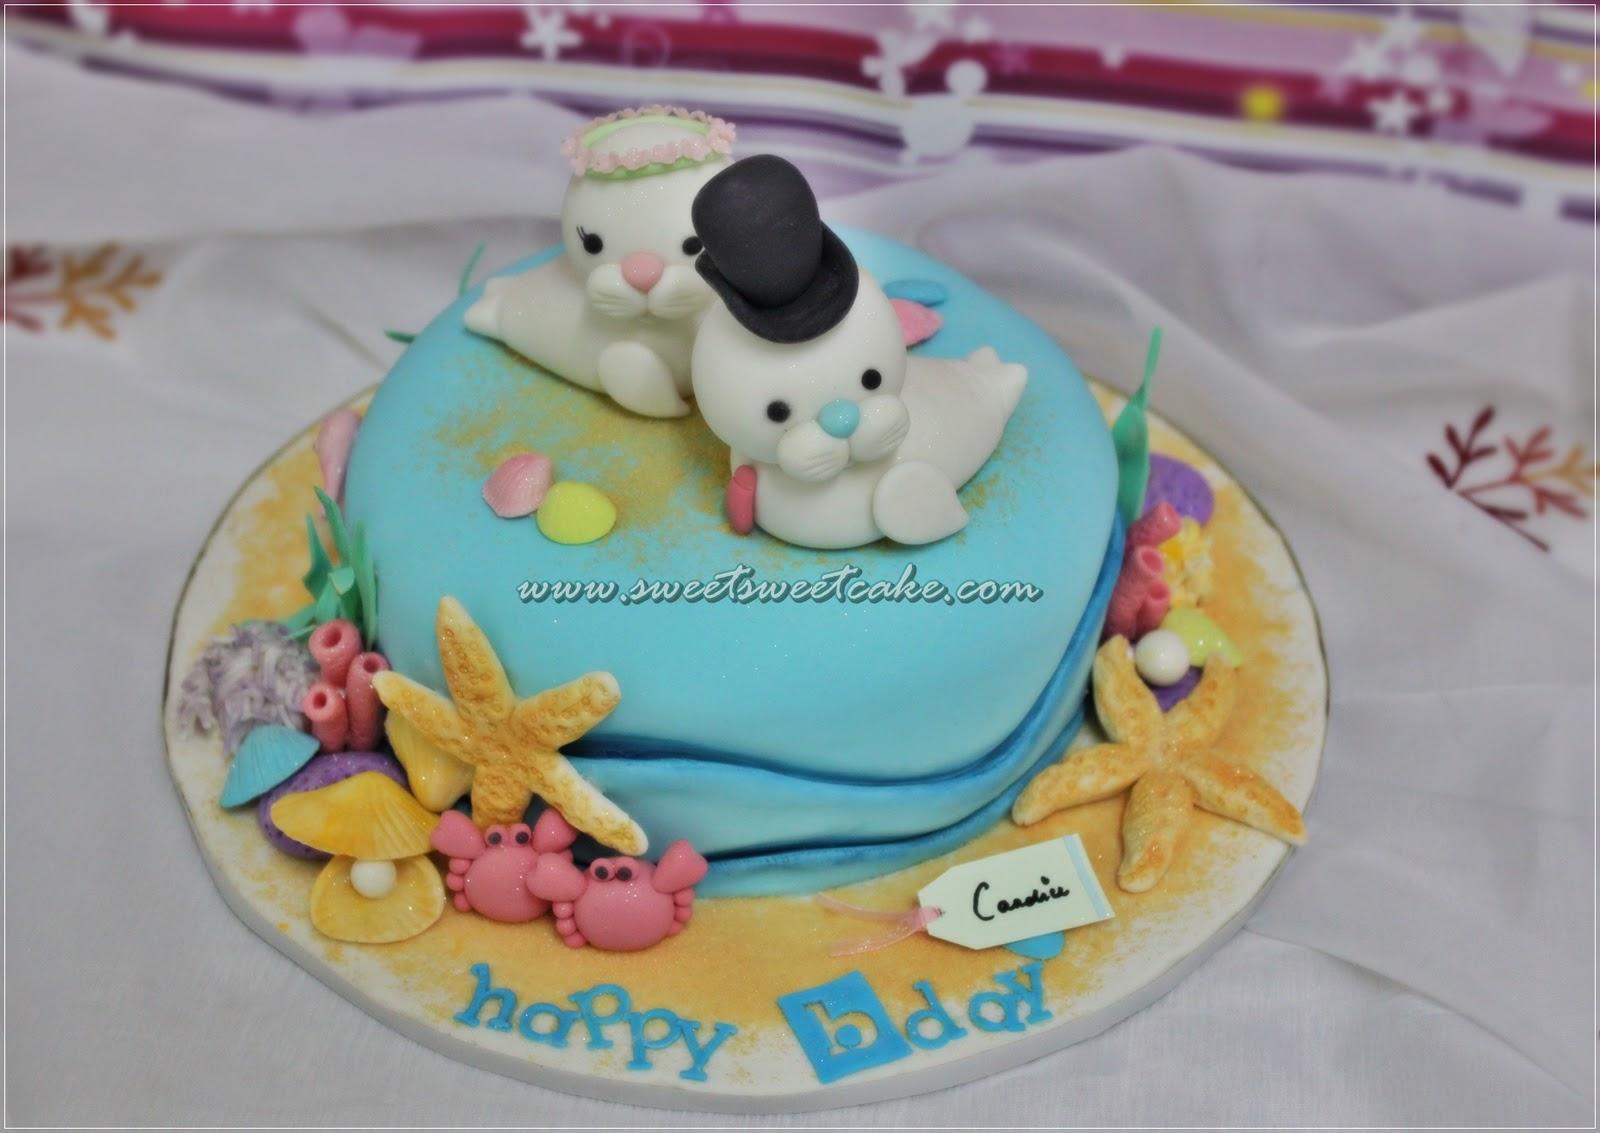 CANDICE - HAPPY HAPPY BIRTHDAY YE.. .